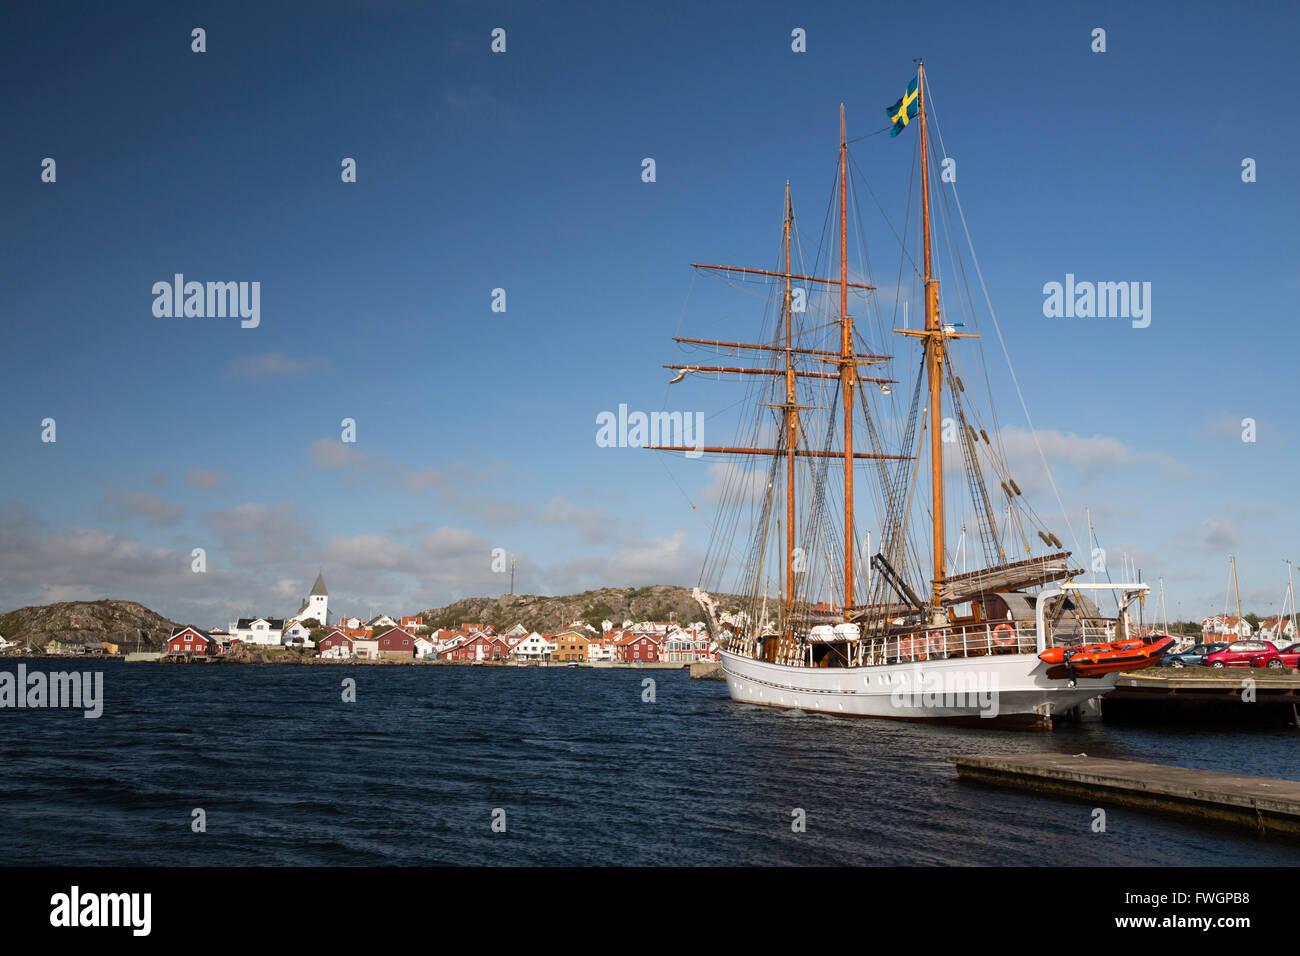 Tall ship in harbour, Skarhamn, Tjorn, Bohuslan Coast, Southwest Sweden, Sweden, Europe - Stock Image